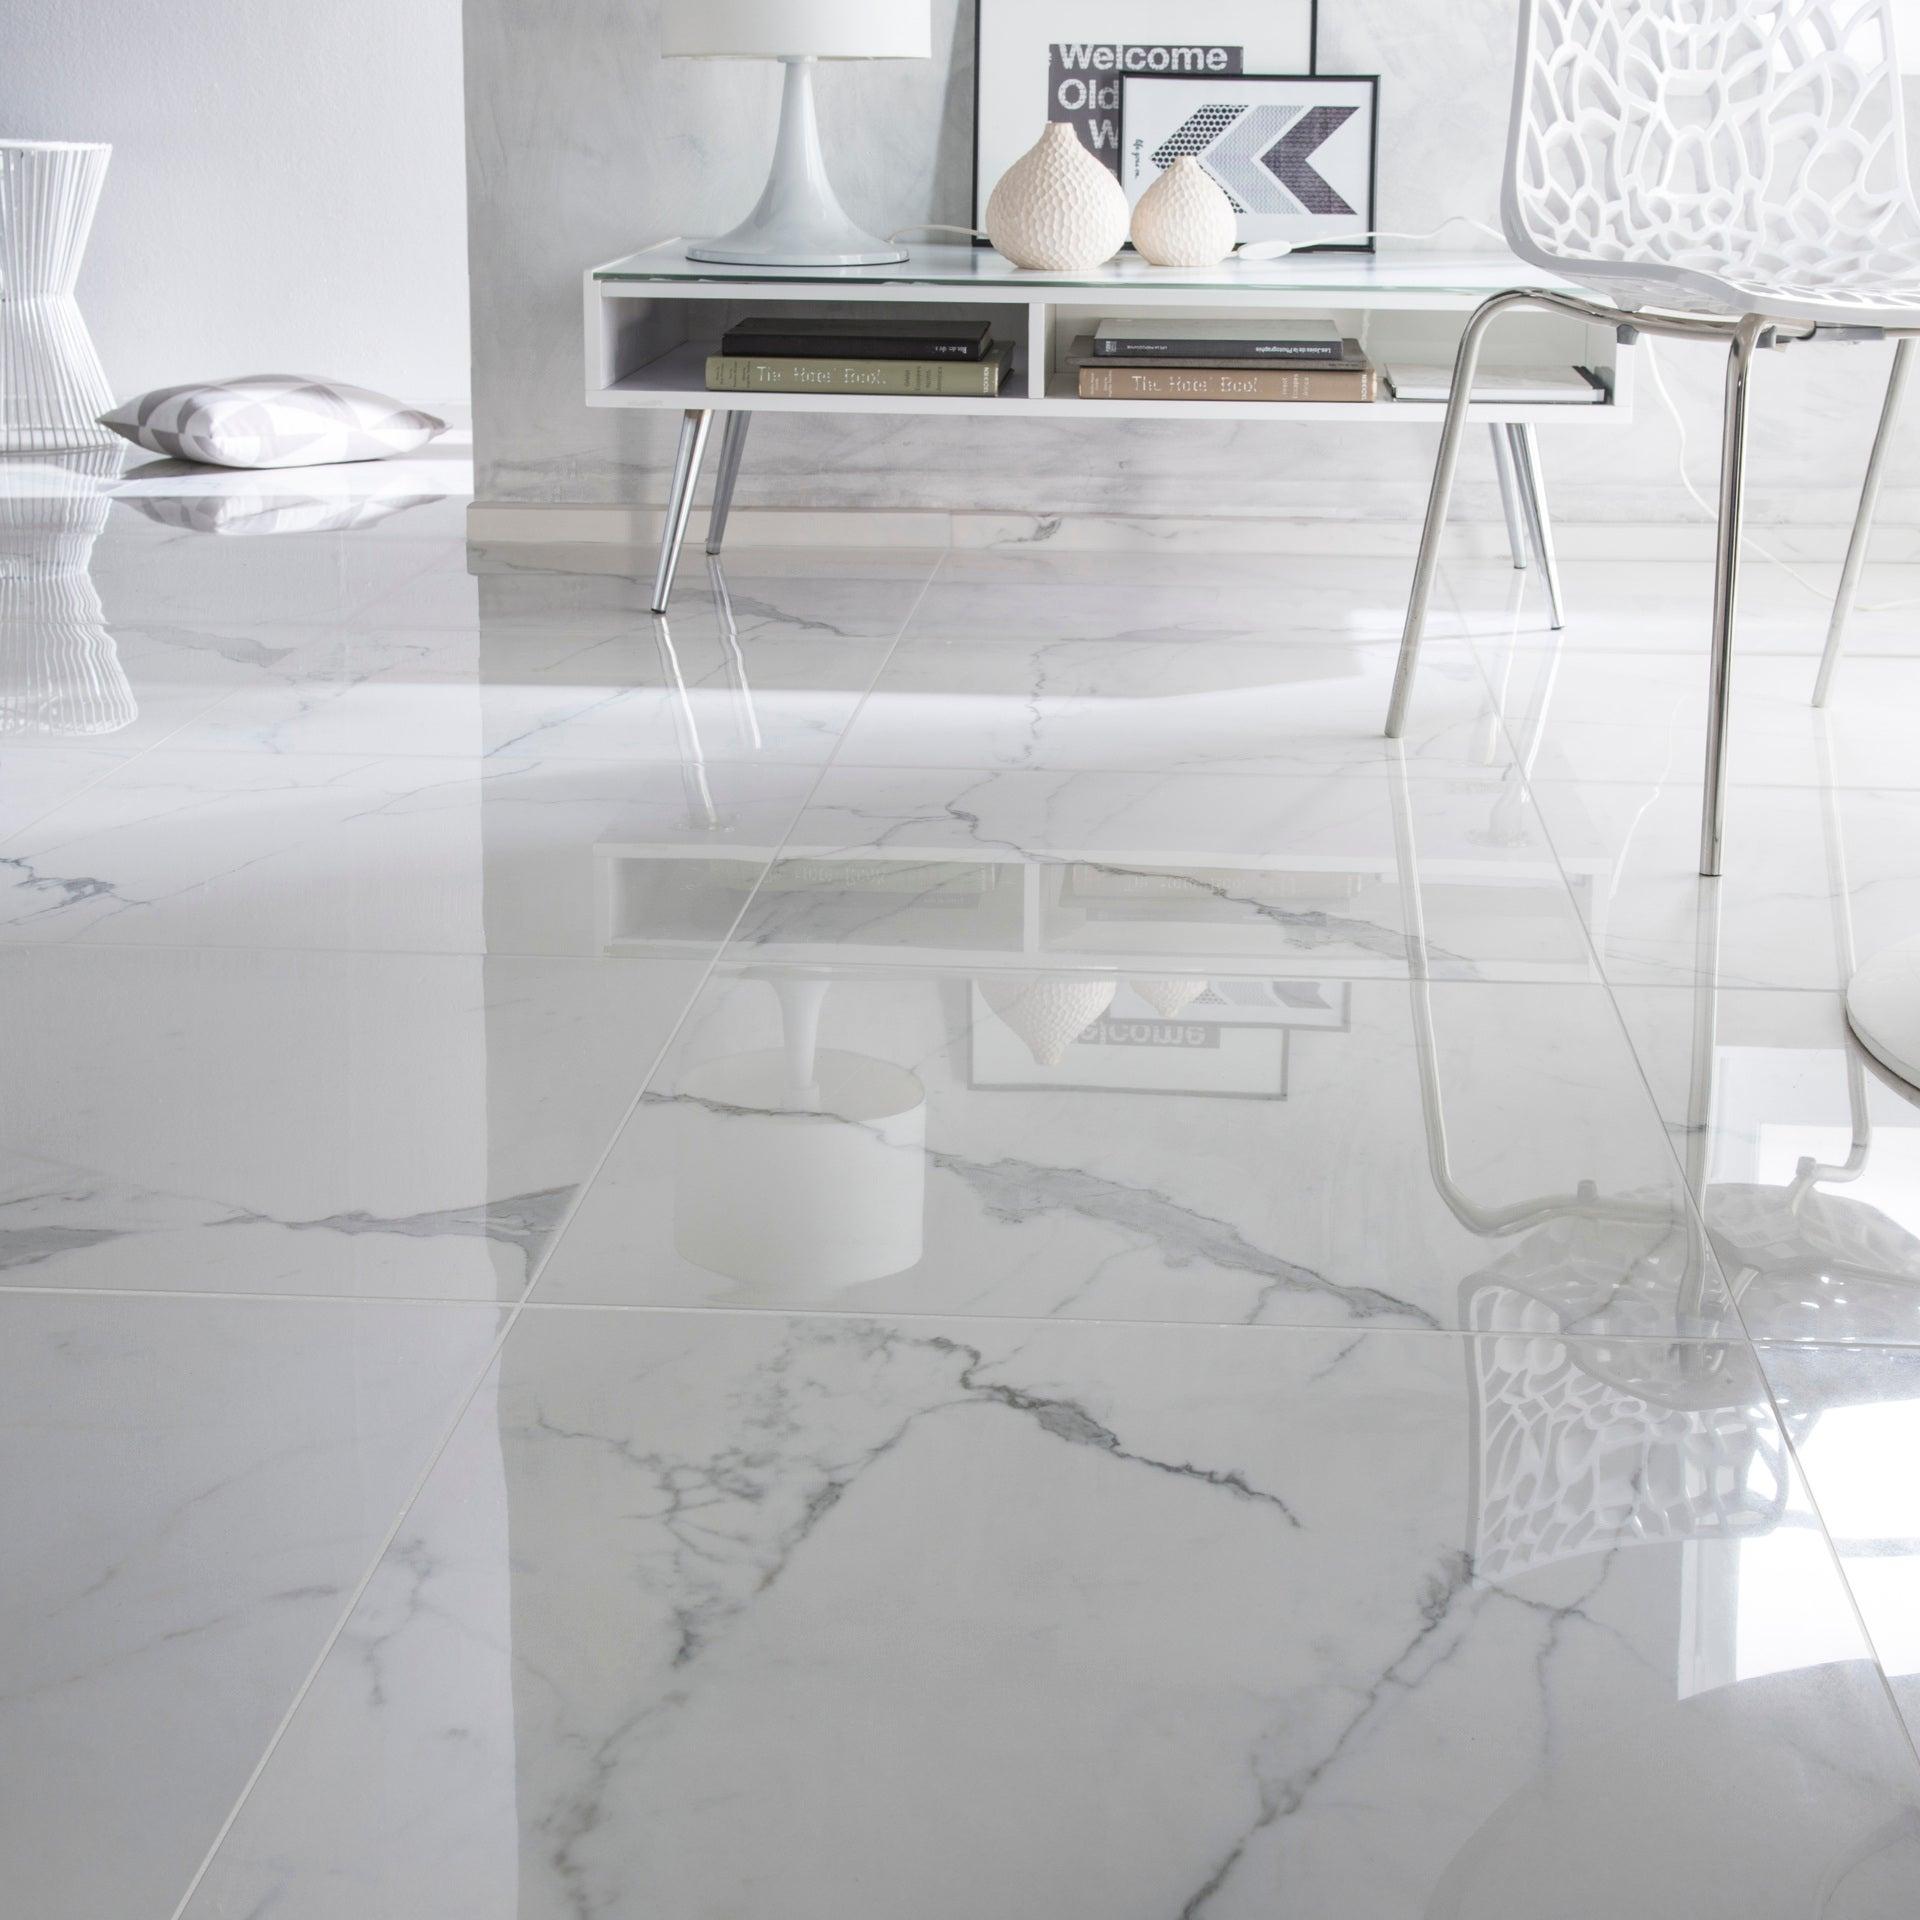 Carrelage sol et mur intenso effet marbre blanc Rimini l.10 x L.10 cm